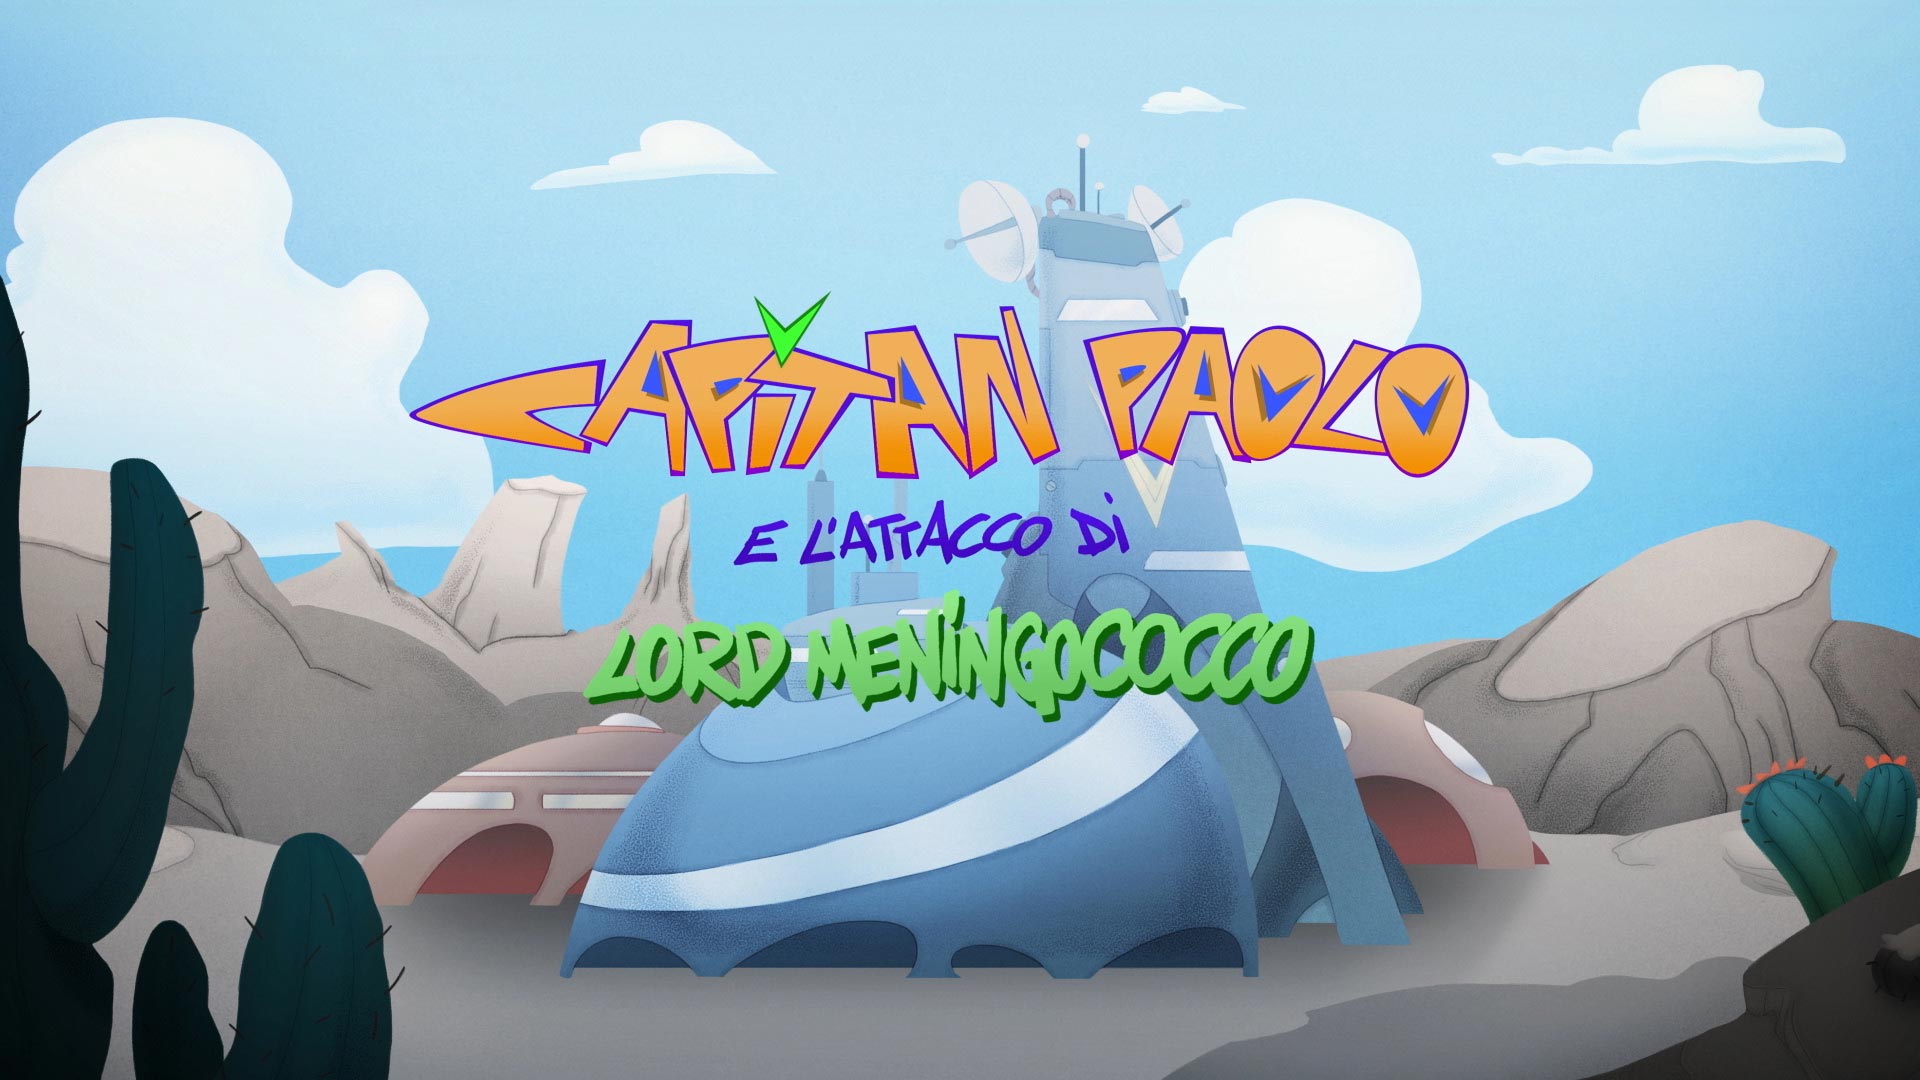 LordMeningococco_animation_character_racoonstudio_motion_educom_1